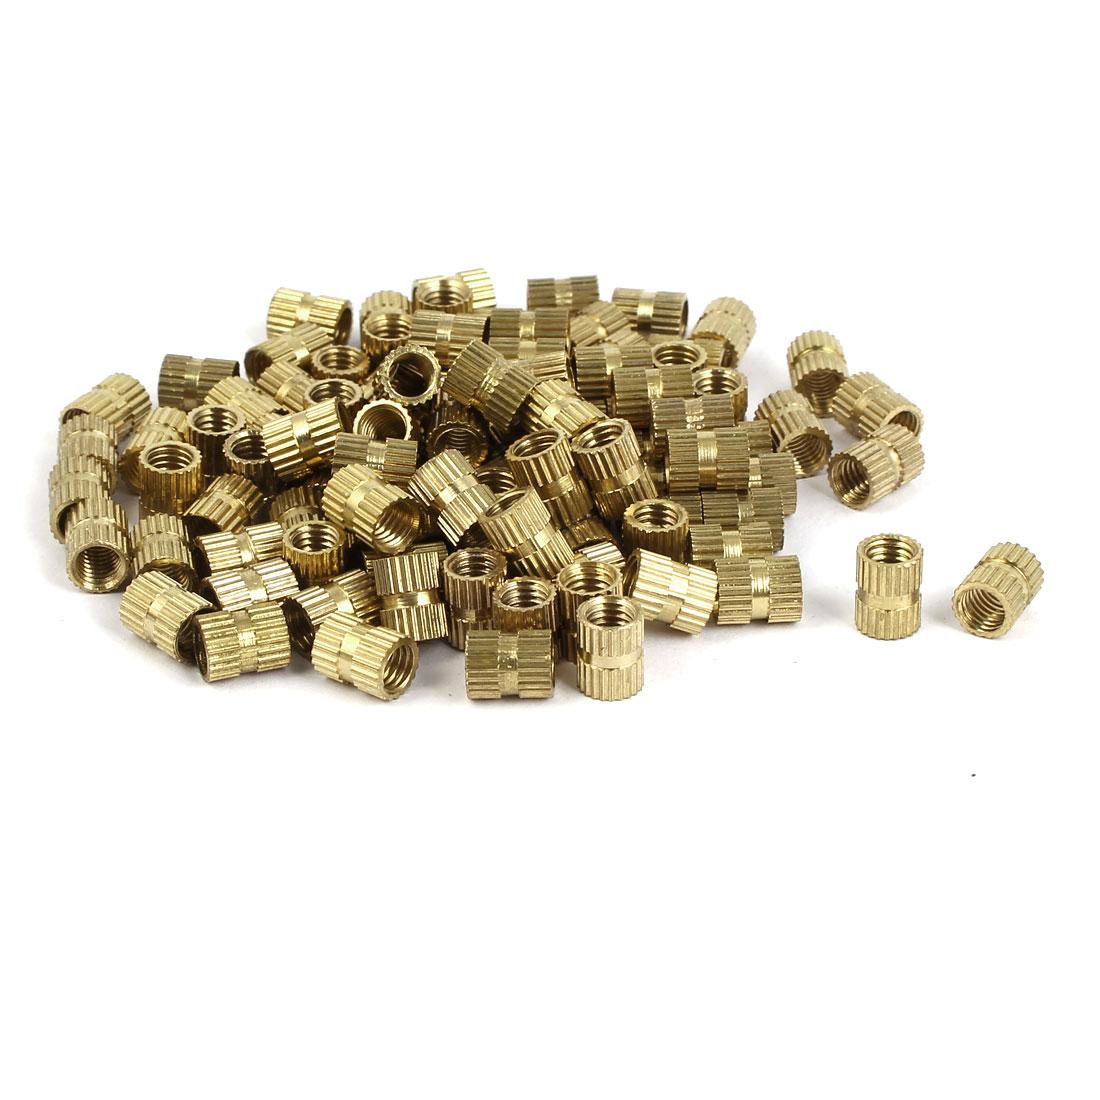 M5 x 8mm x 6.3mm Brass Knurled Threaded Round Insert Embedded Nuts 100PCS